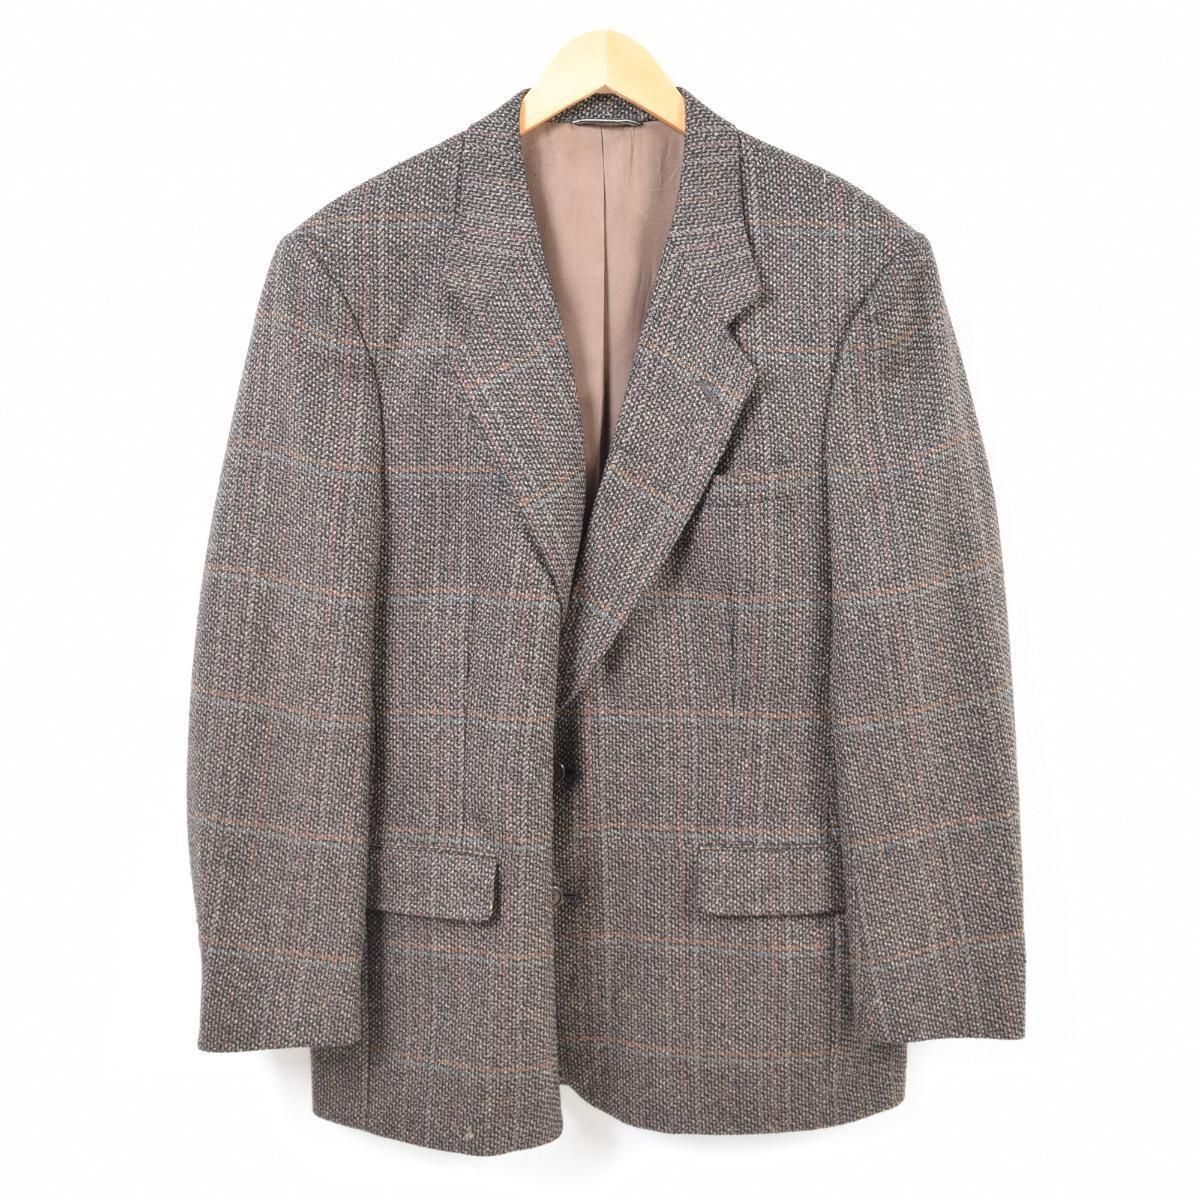 new styles bd6d0 fd21a 80年代 クリスチャンディオール Christian Dior MONSIEUR チェック柄 テーラードジャケット USA製 メンズM ヴィンテージ  /wao0576 【171215】